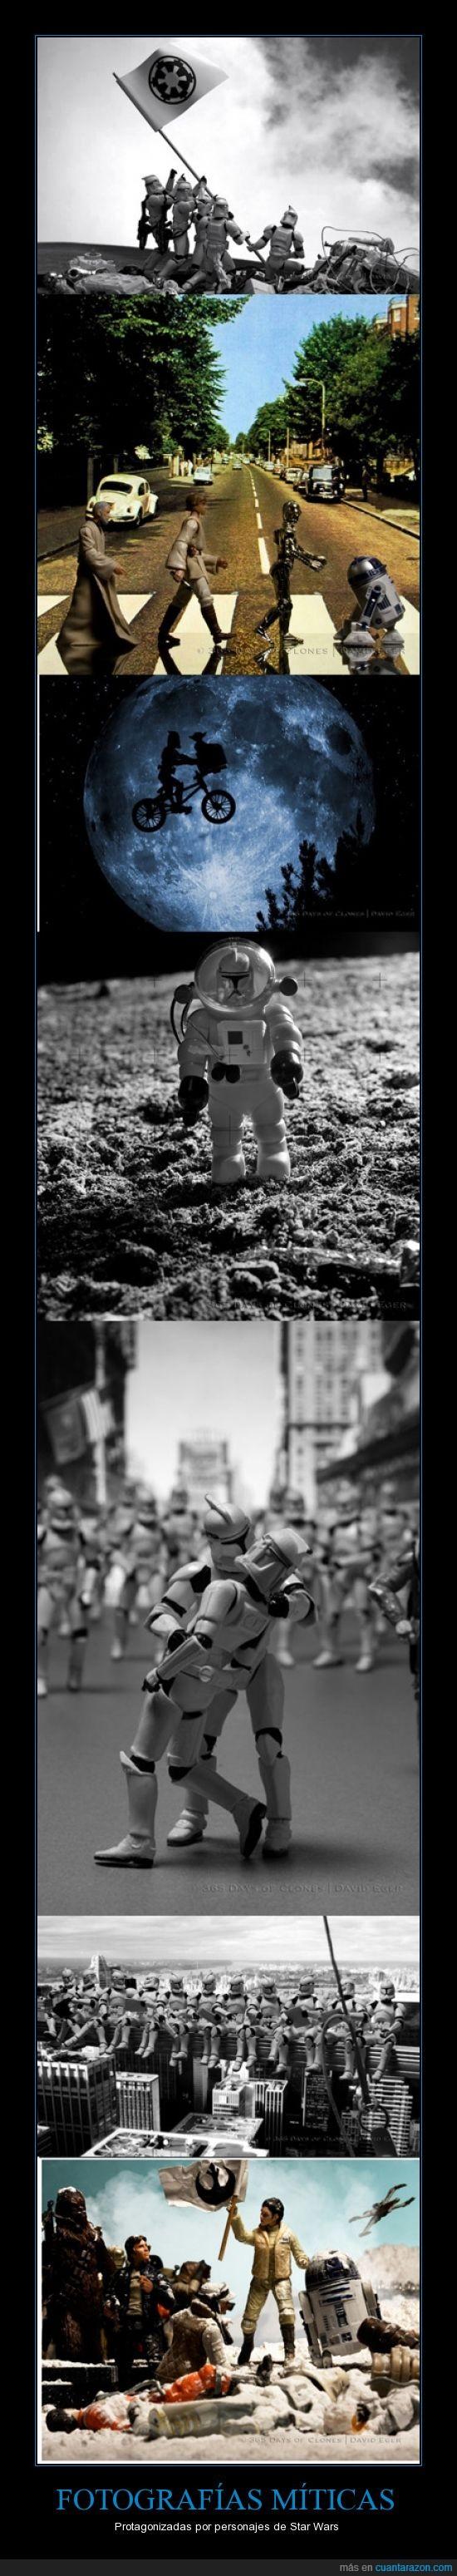 figura,fotografia,marinero,mitica,soldado,star wars